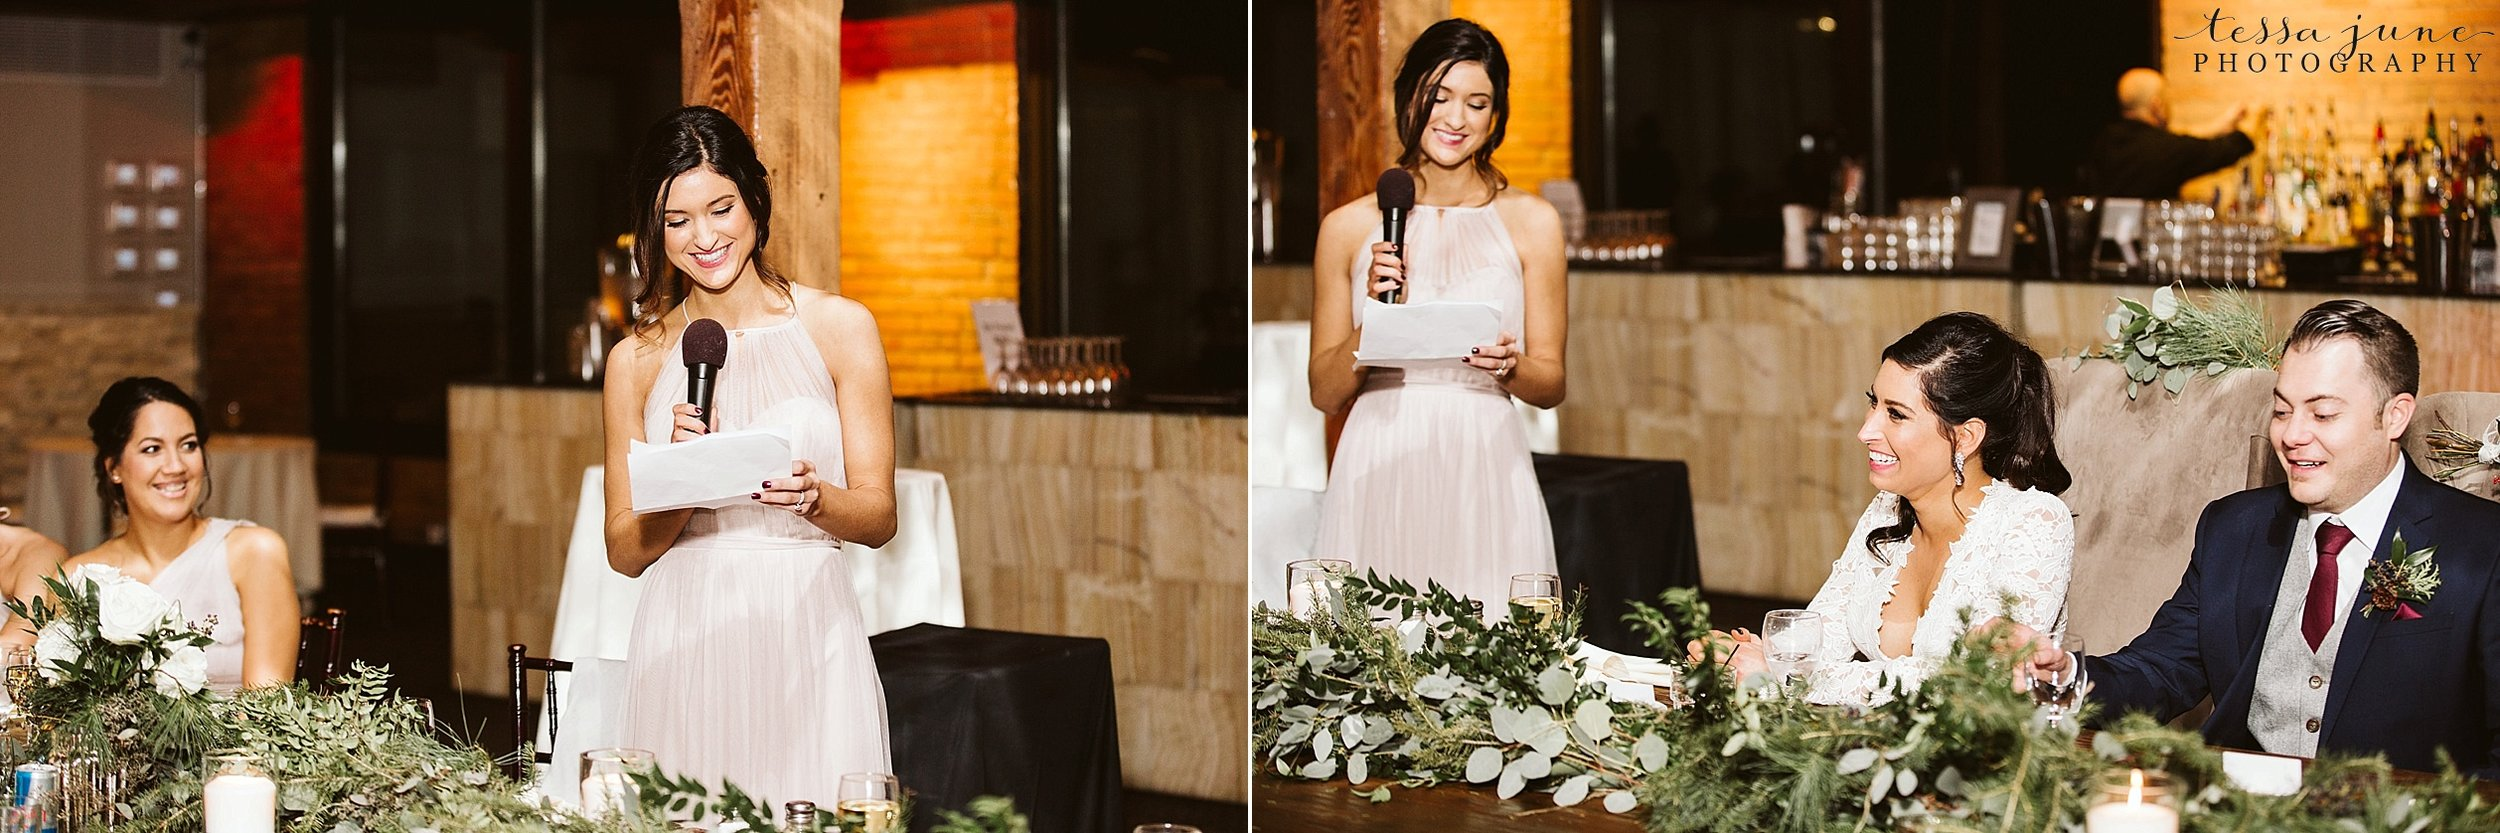 minneapolis-event-center-winter-romantic-snow-wedding-december-197.jpg